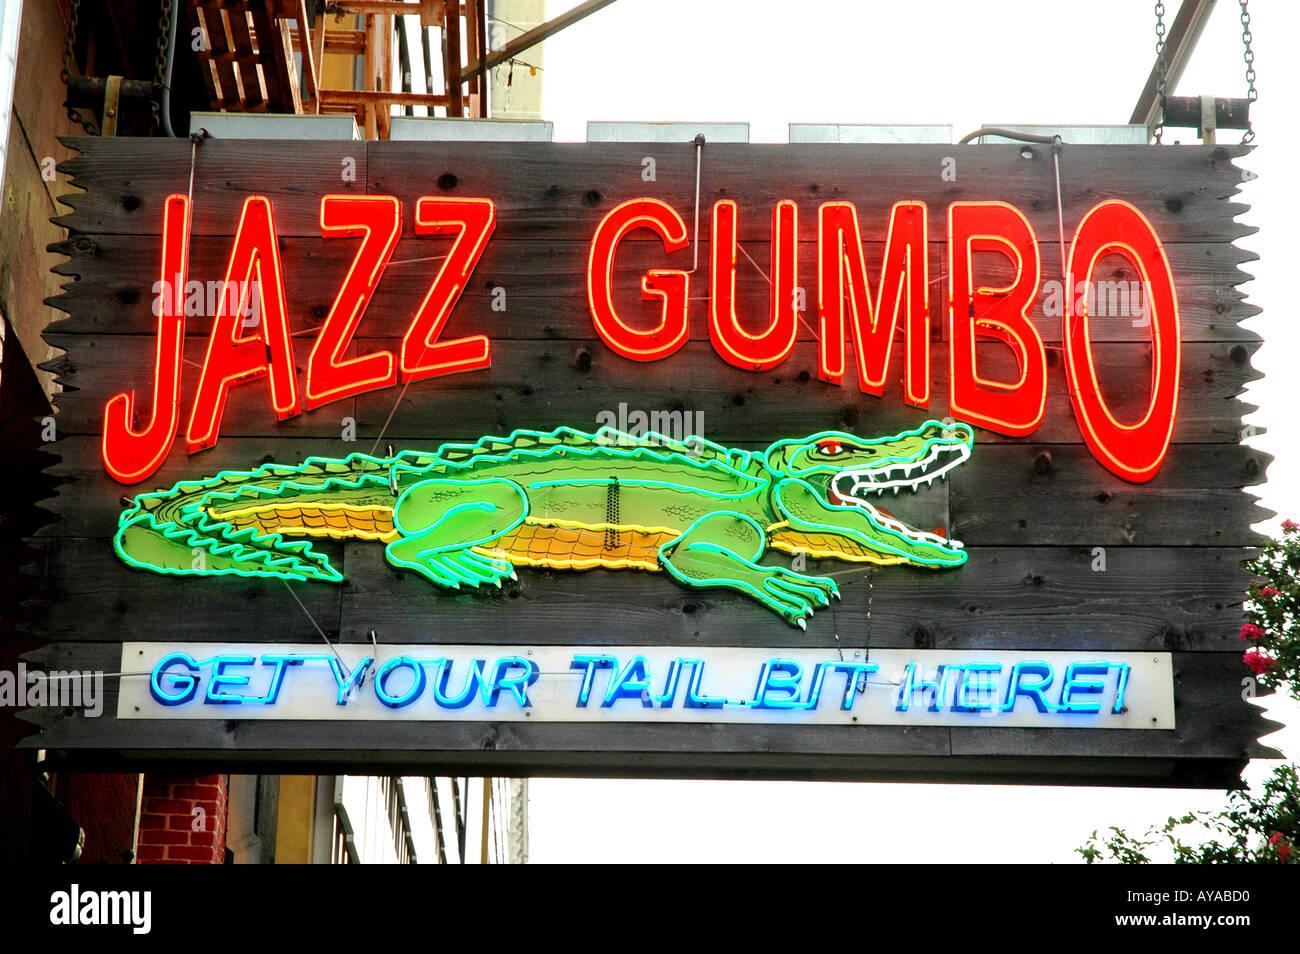 New Orleans LA Louisiana Jazz Gumbo sign - Stock Image